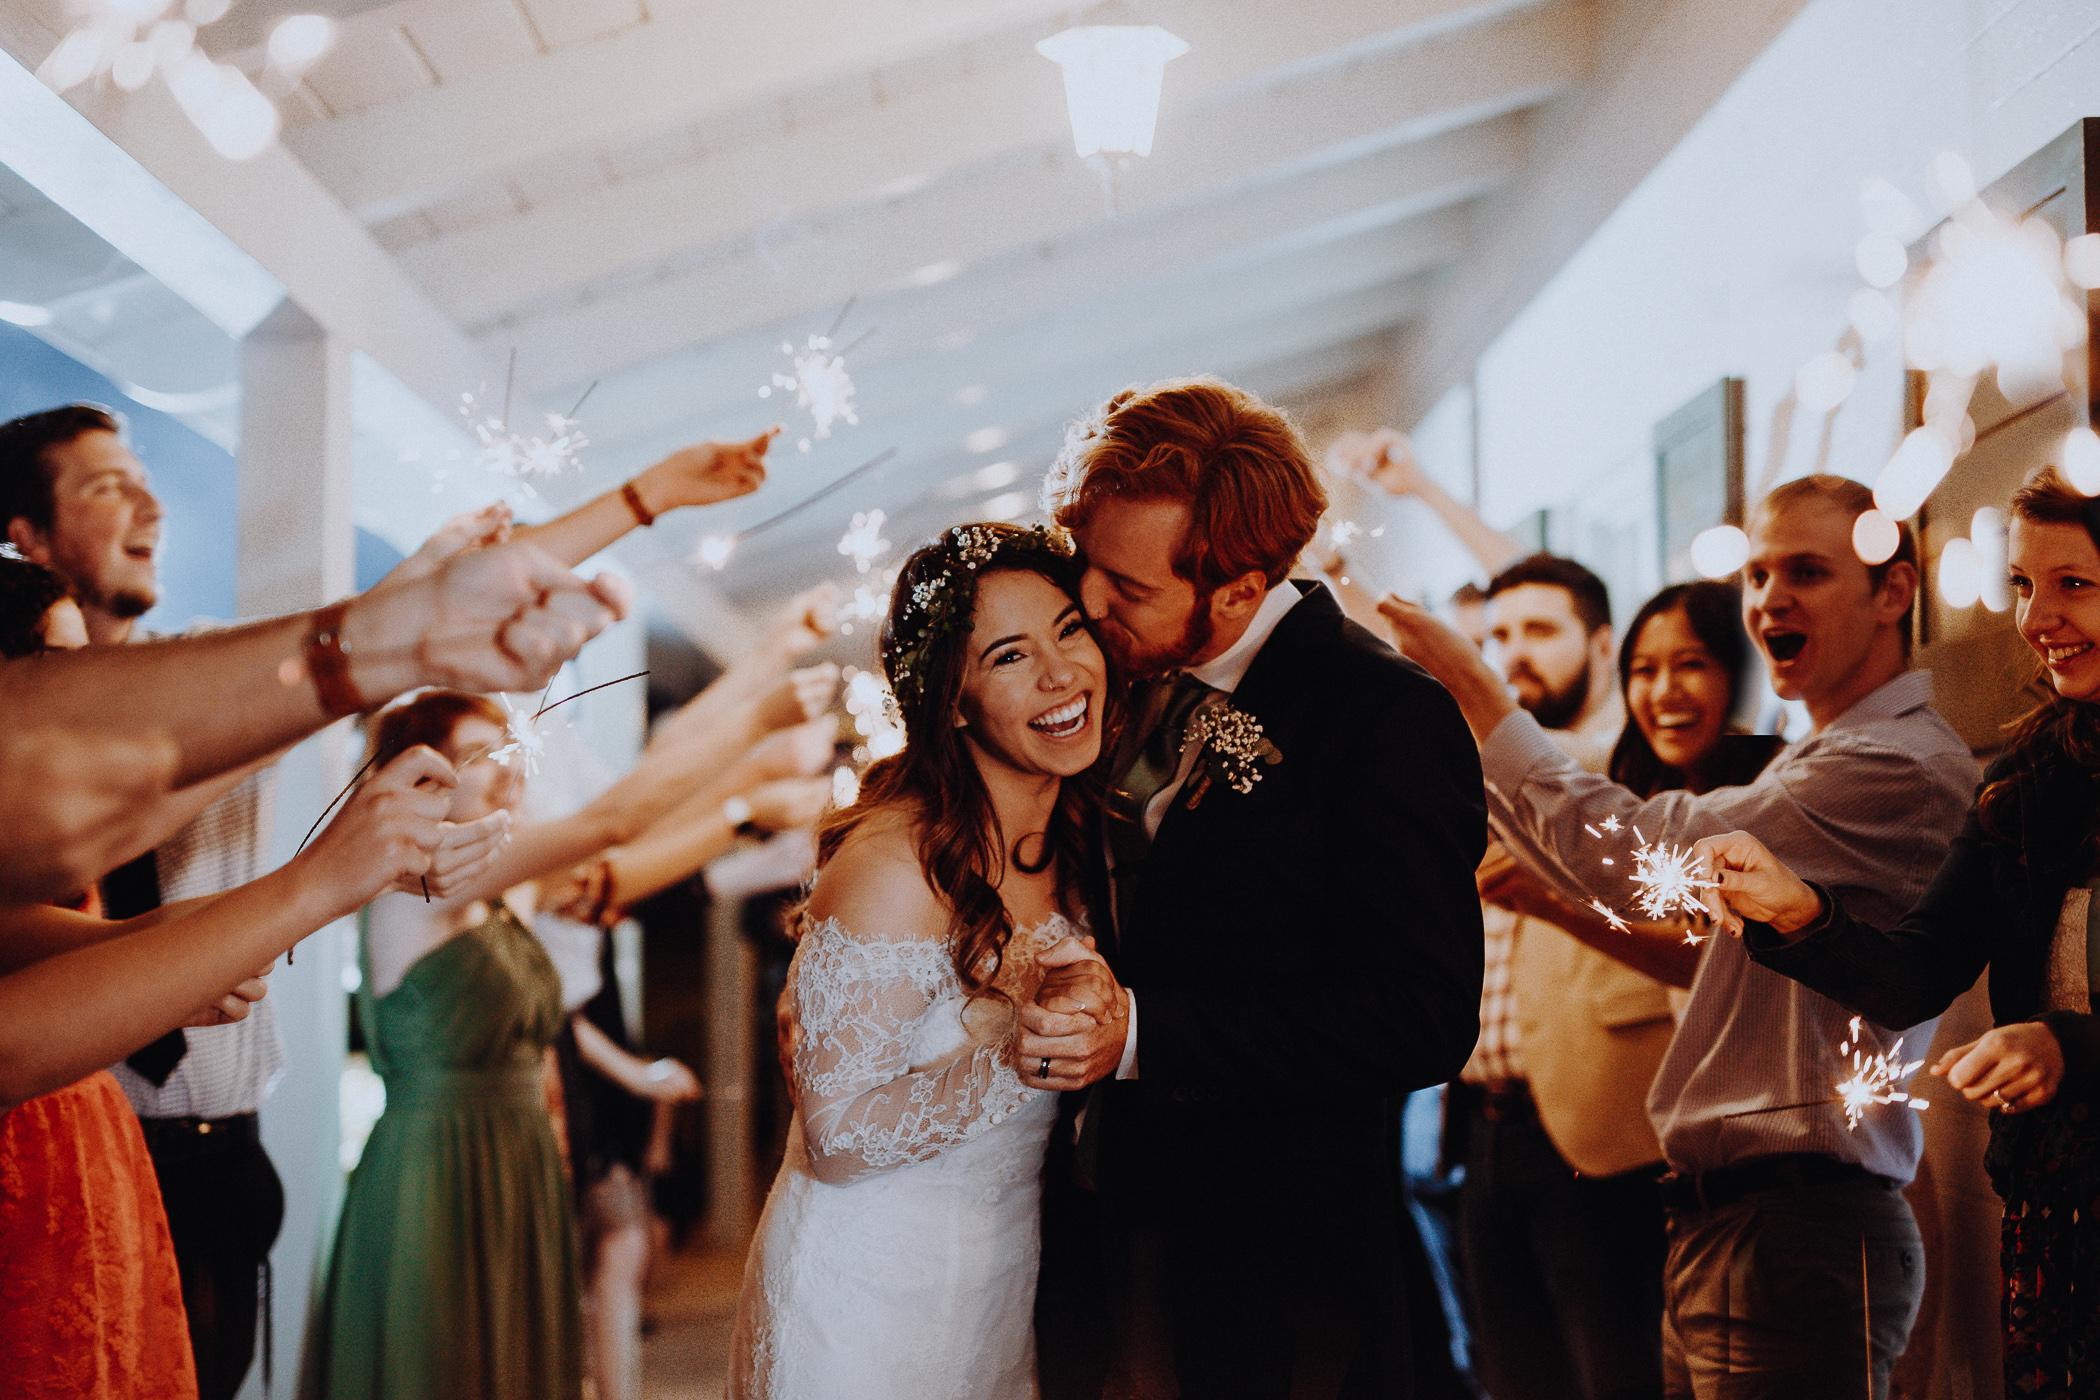 181104-Luxium-Weddings-Arizona-@matt__Le-Brandon-Kariana-Phoenix-Valley-Garden-Center-1155a.jpg